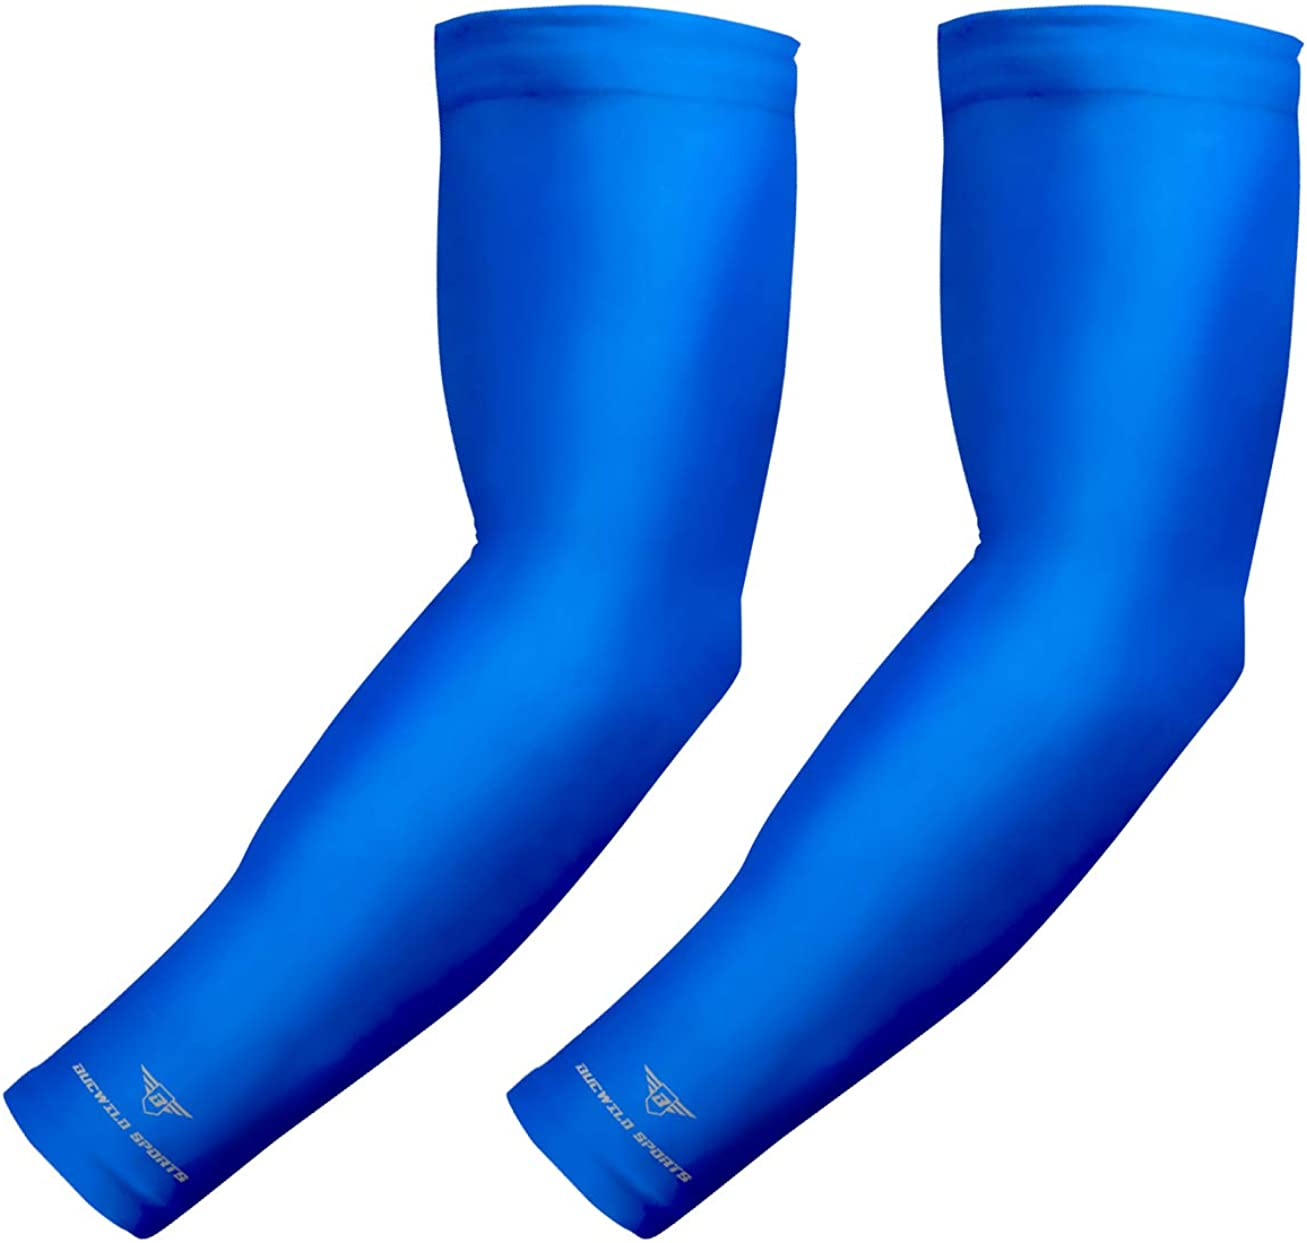 1 Arm Sleeve Youth /& Adult Sizes Baseball Football Basketball Sports Bucwild Sports Compression Arm Sleeve